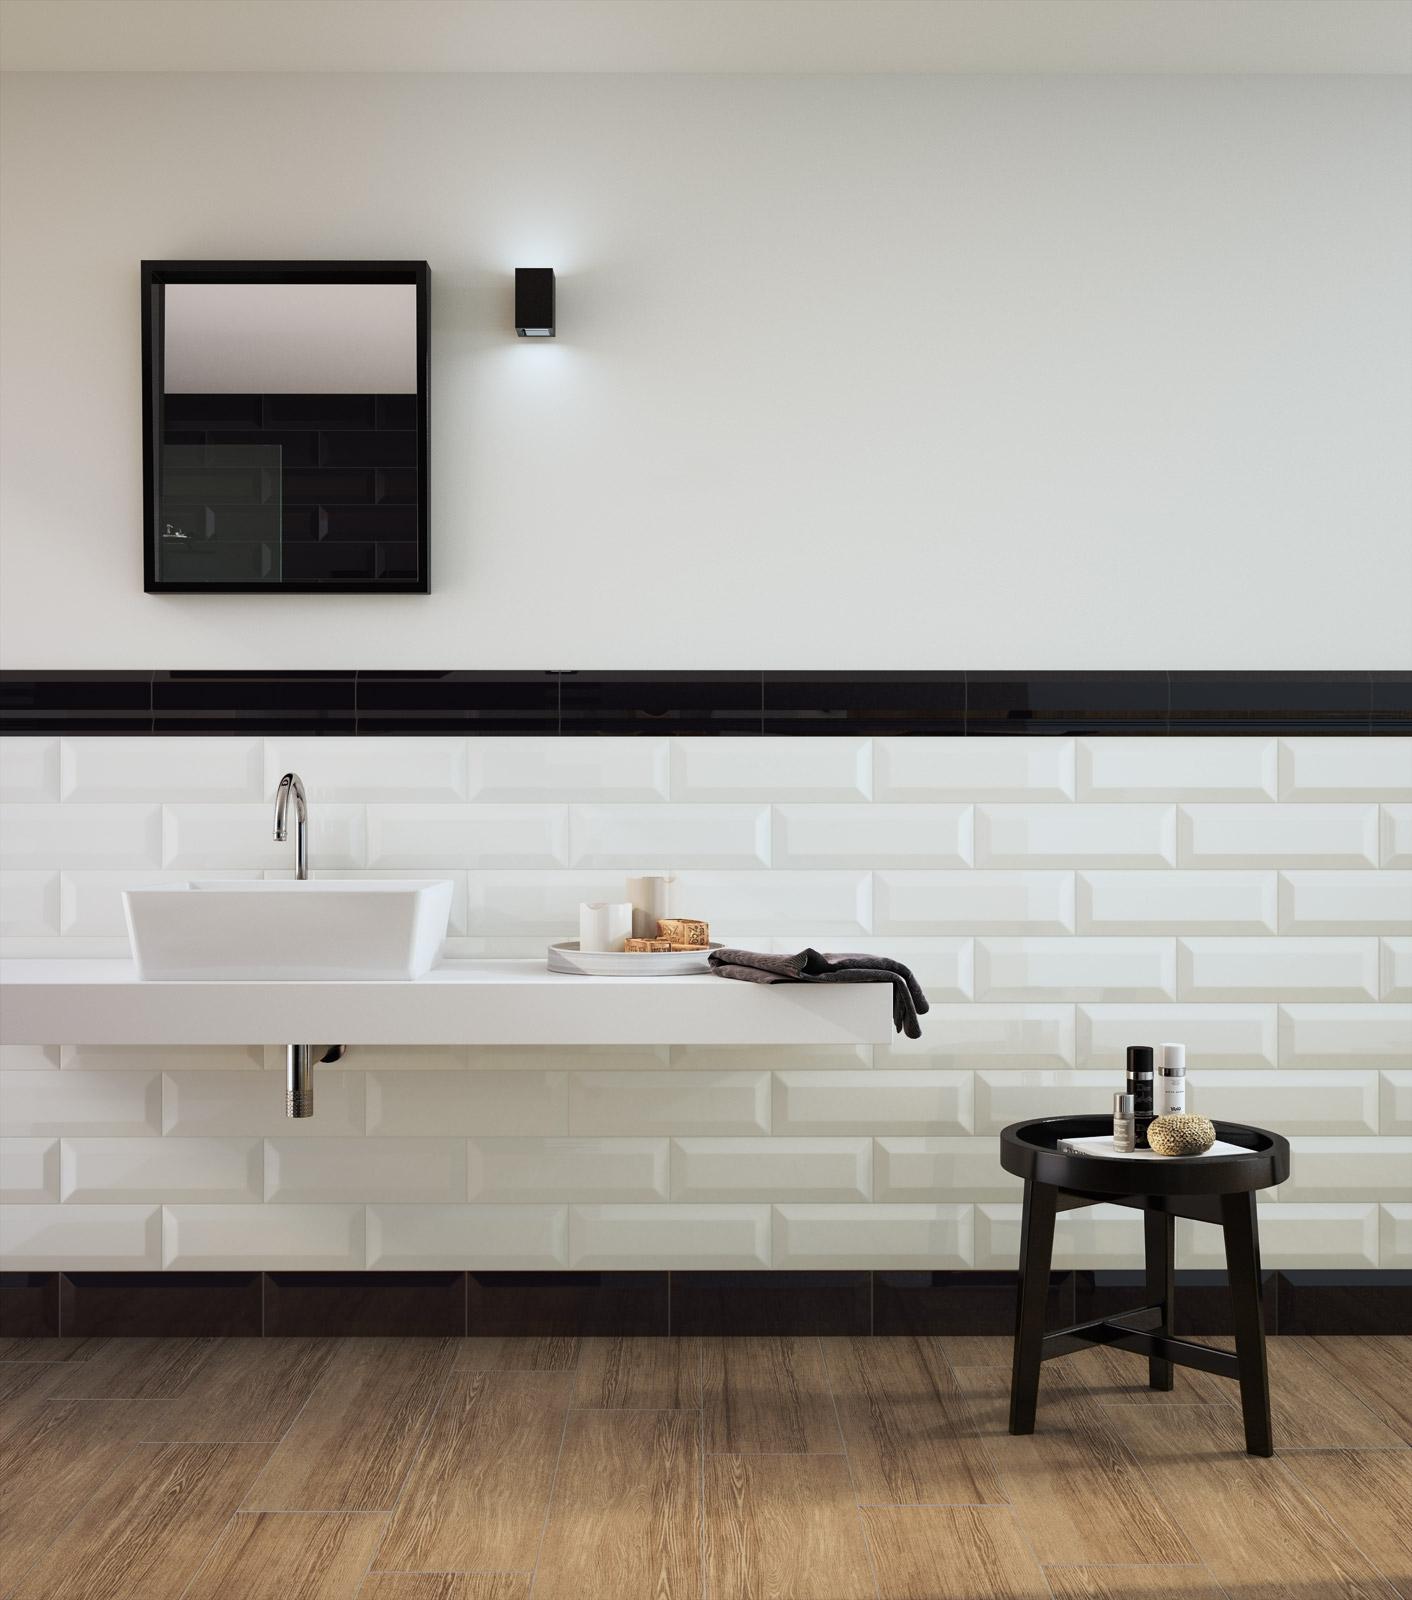 oxford piastrelle diamantate lucide marazzi. Black Bedroom Furniture Sets. Home Design Ideas